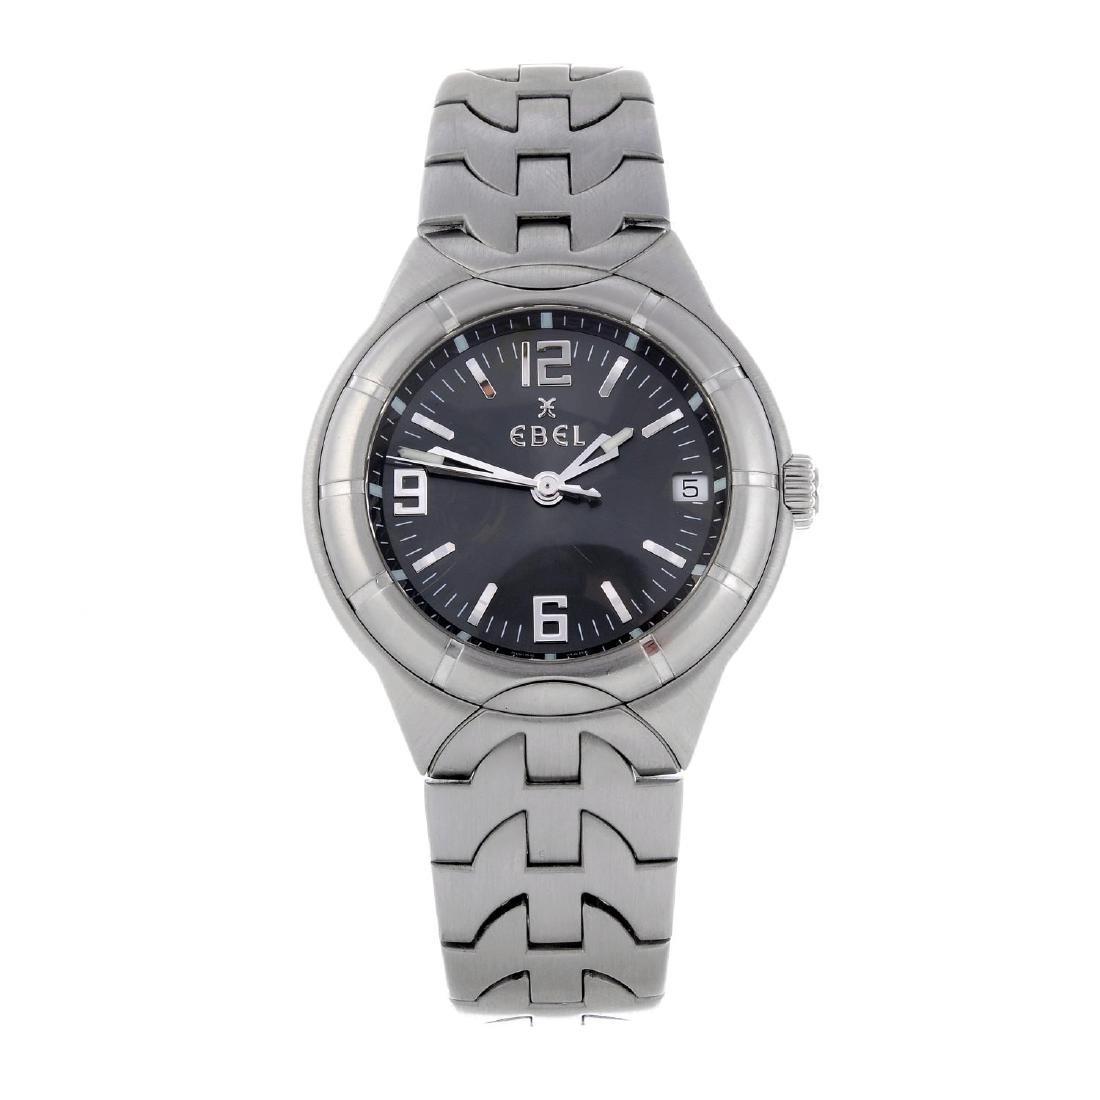 EBEL - a gentleman's Type E bracelet watch. Stainless